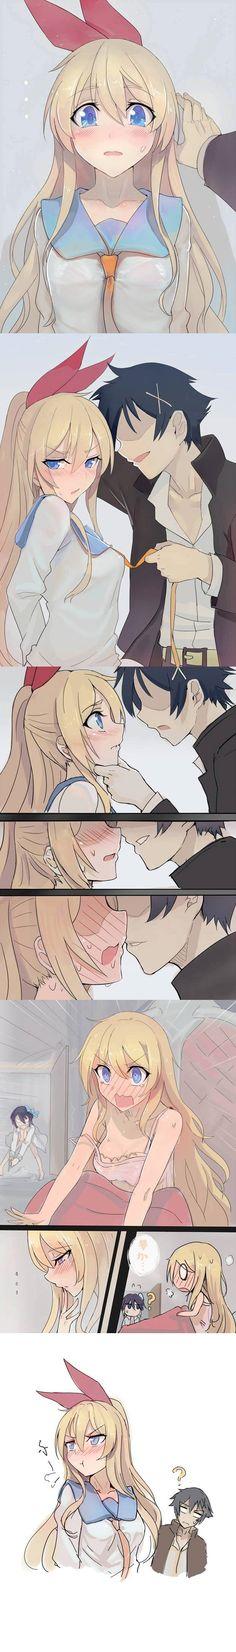 Haha, Raku in her dream so aggresive